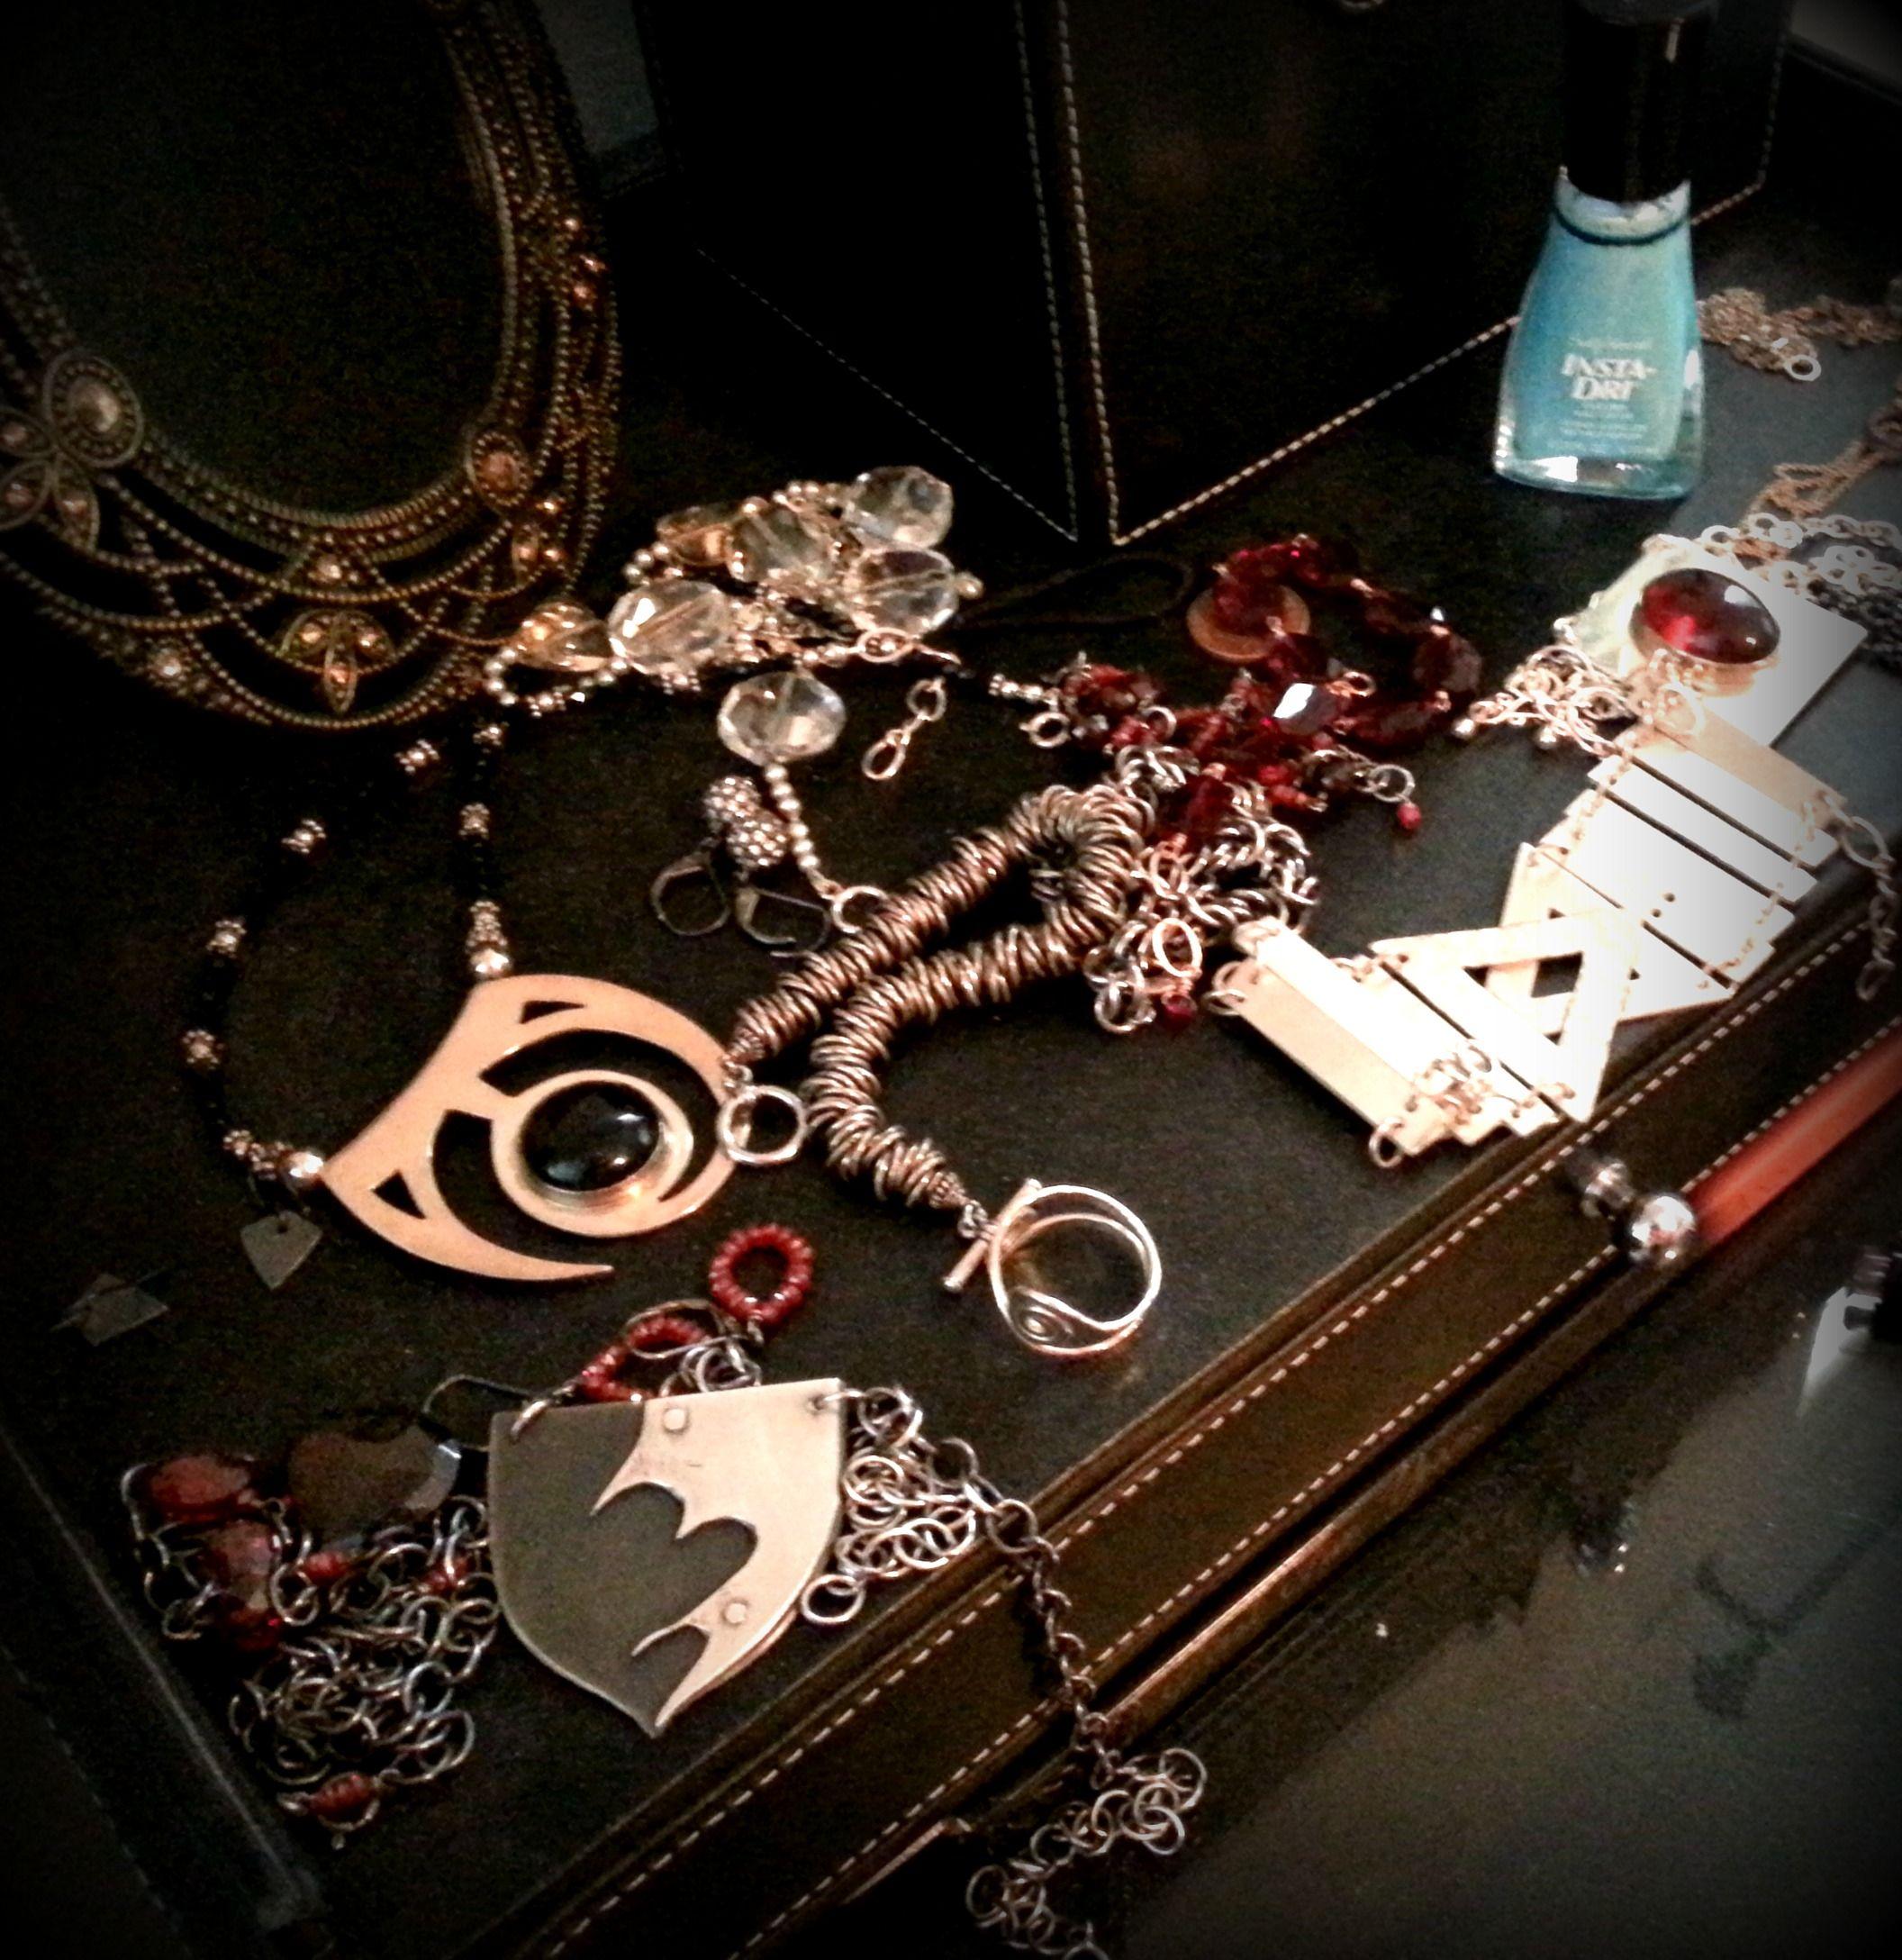 My jewelry hoarding stash, I LOVE every piece. #jewelry #earrings #bracelet #stash #metal #medieval #shield #maidenattire #necklaces #rockit #heavymetal